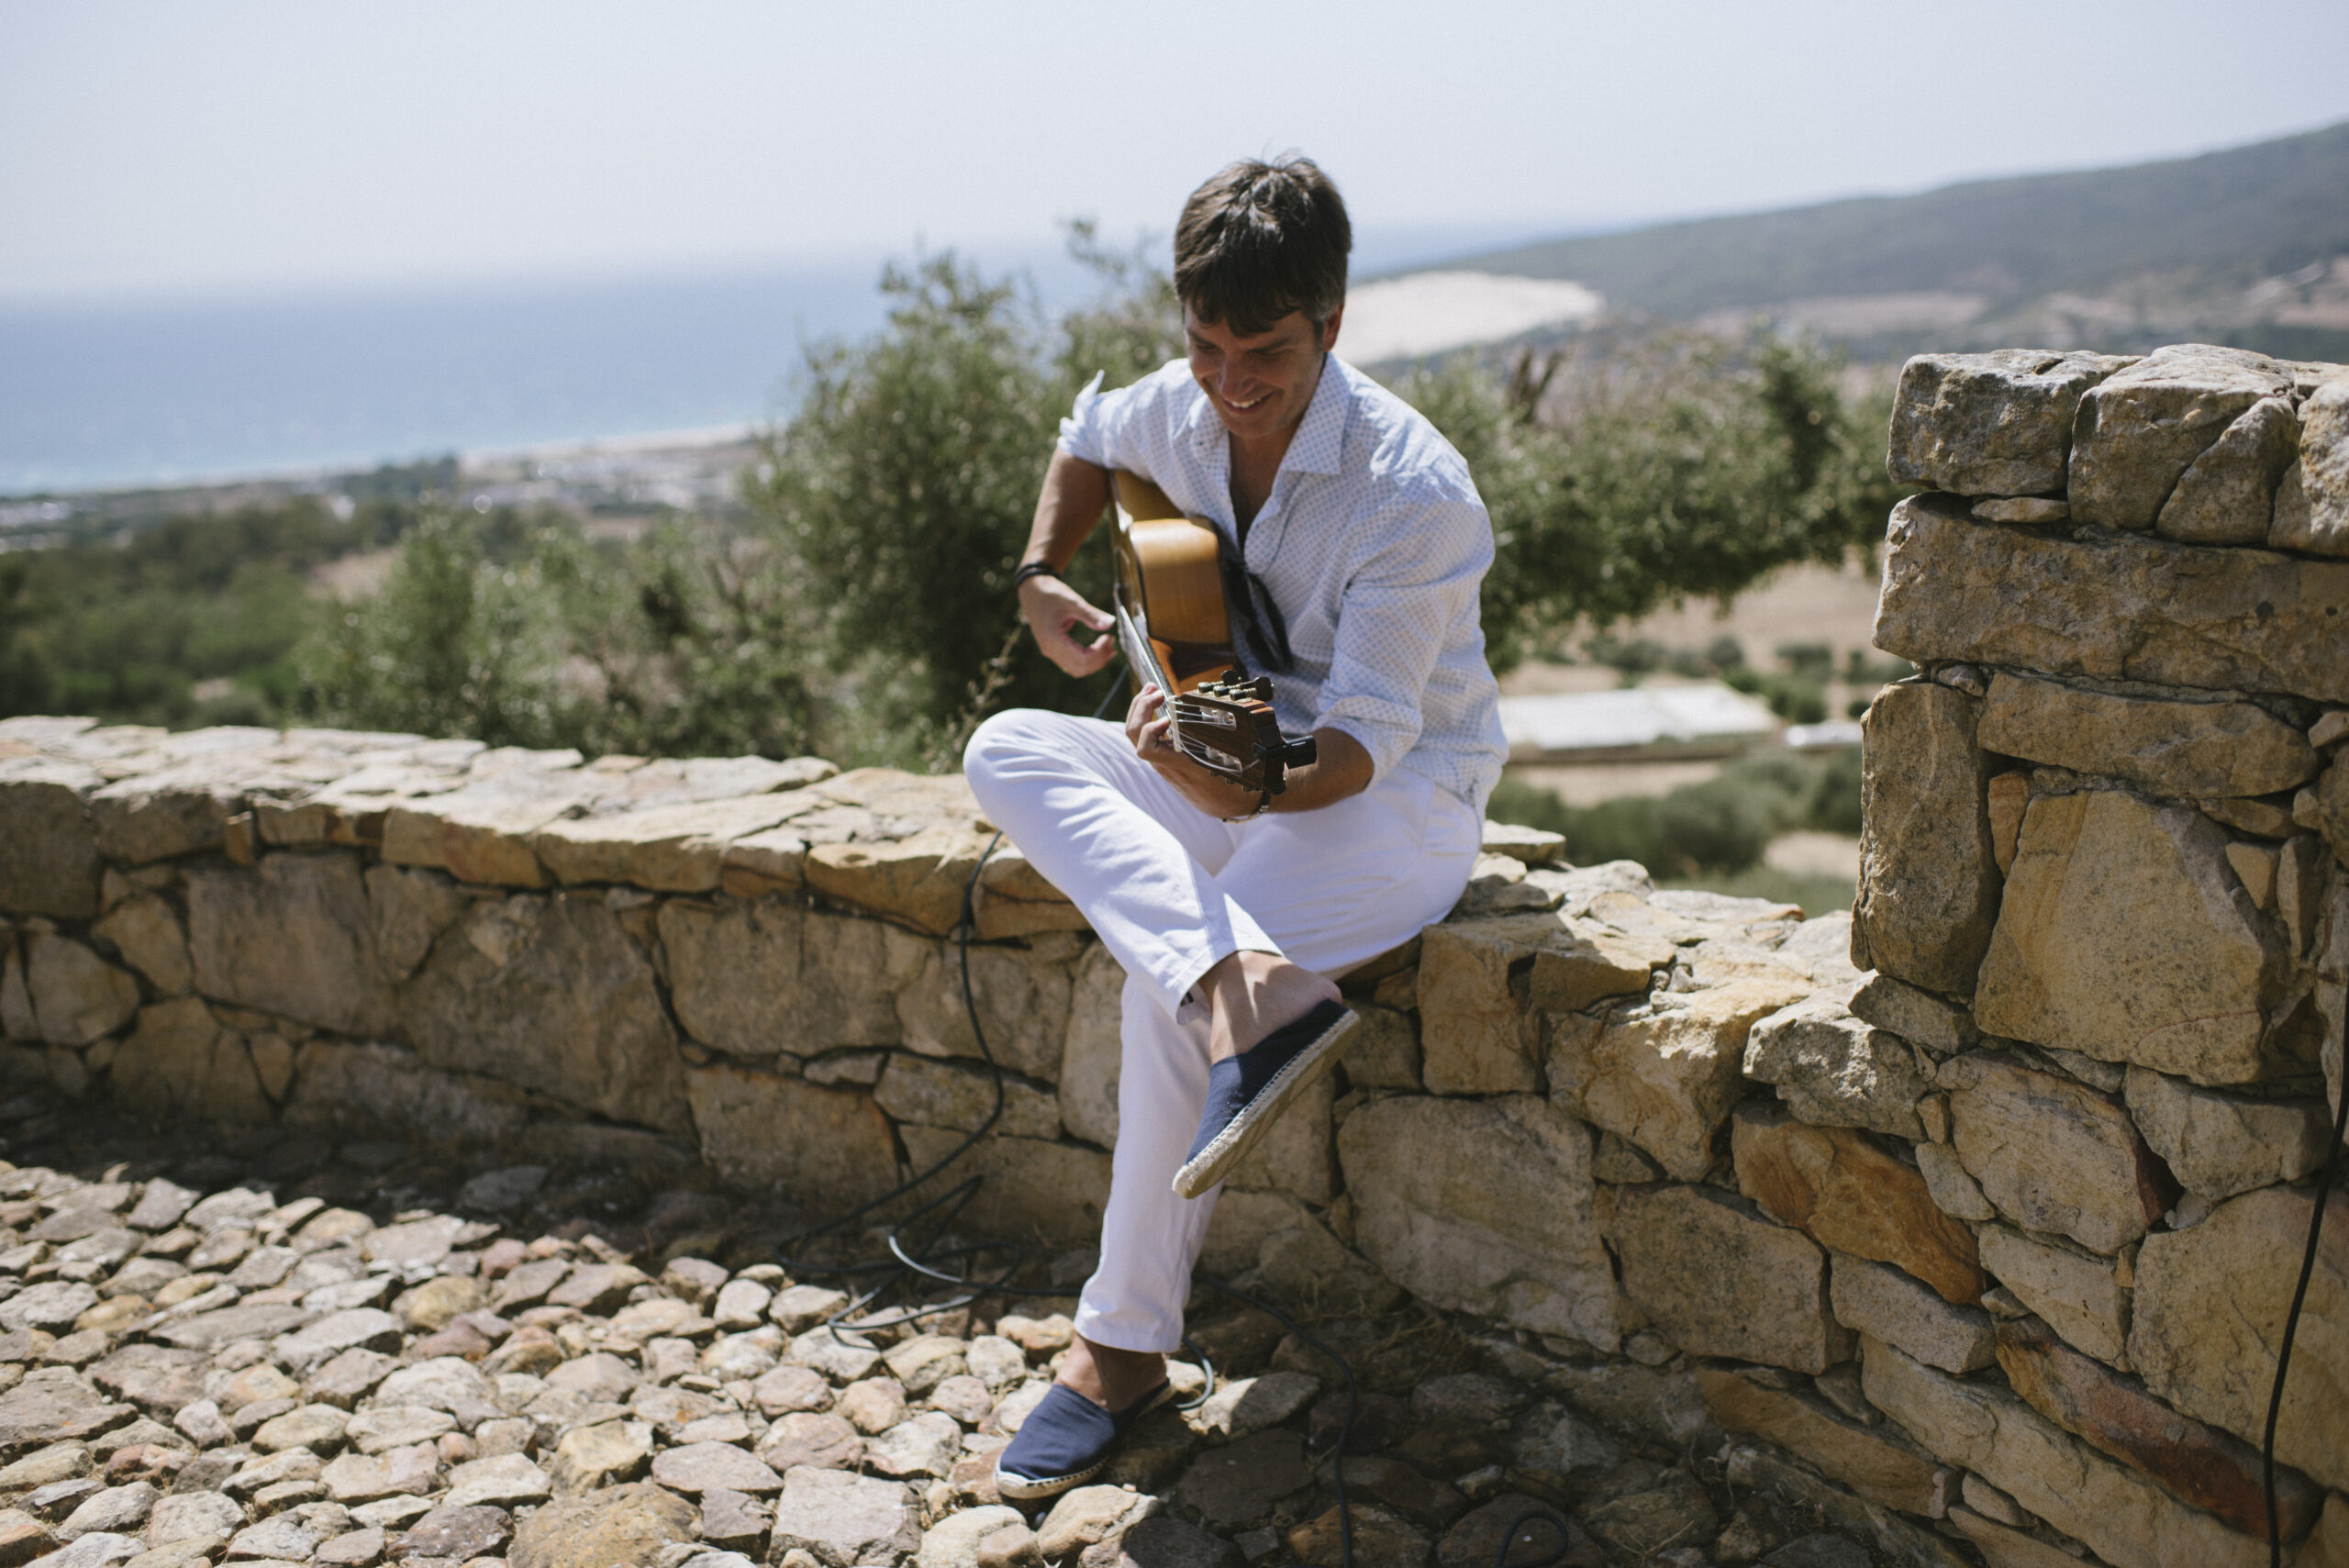 Jesus Gomez, Spanish guitarist